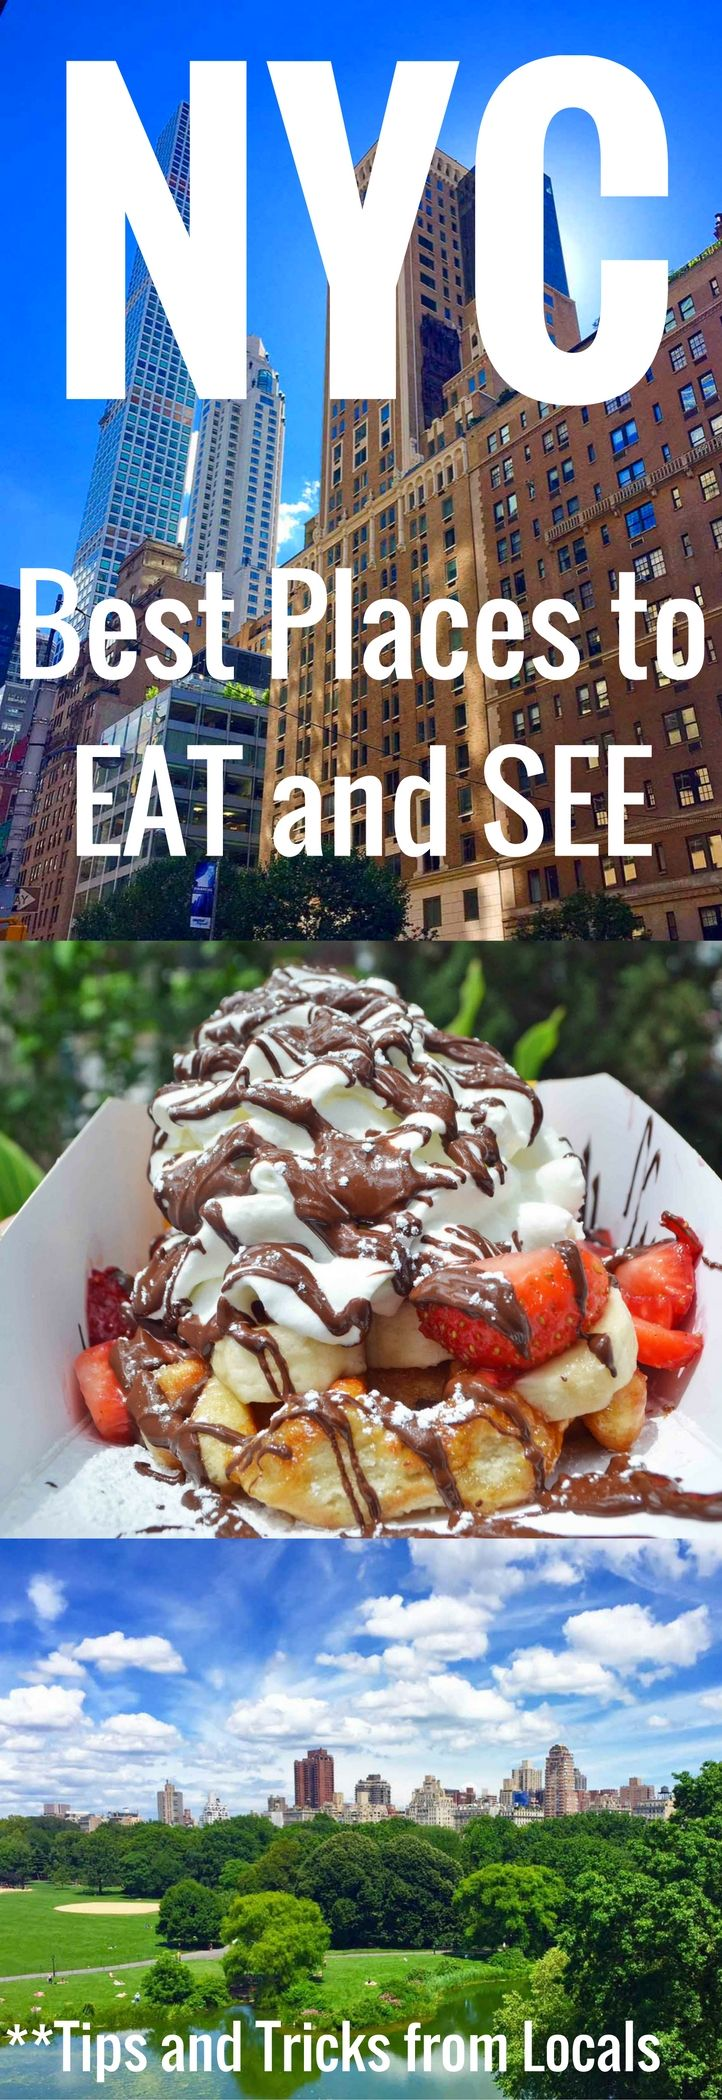 25+ Best Ideas About New York City On Pinterest